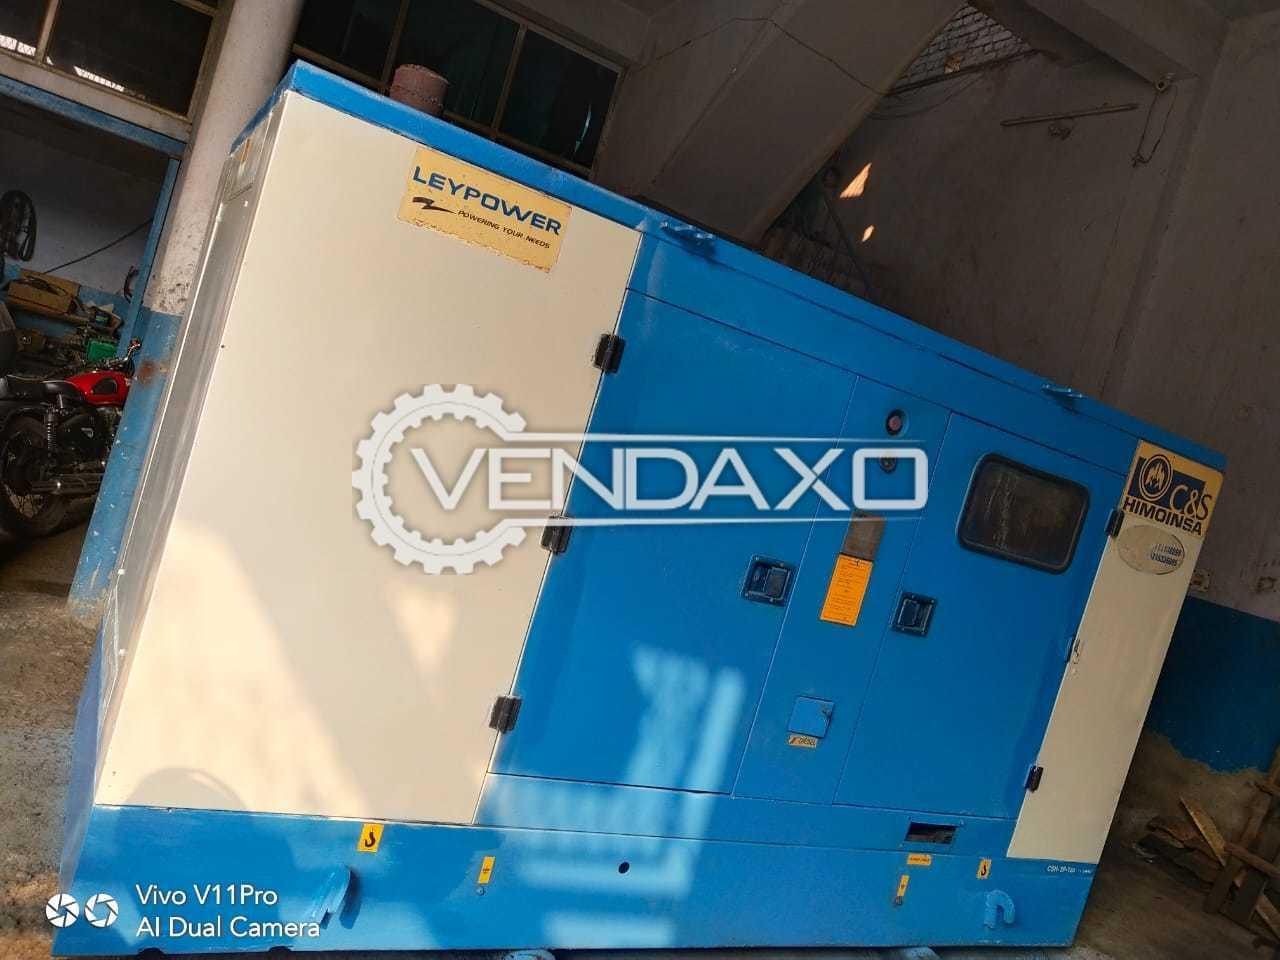 Leypower Himoinsa Diesel Generator - 125 Kva